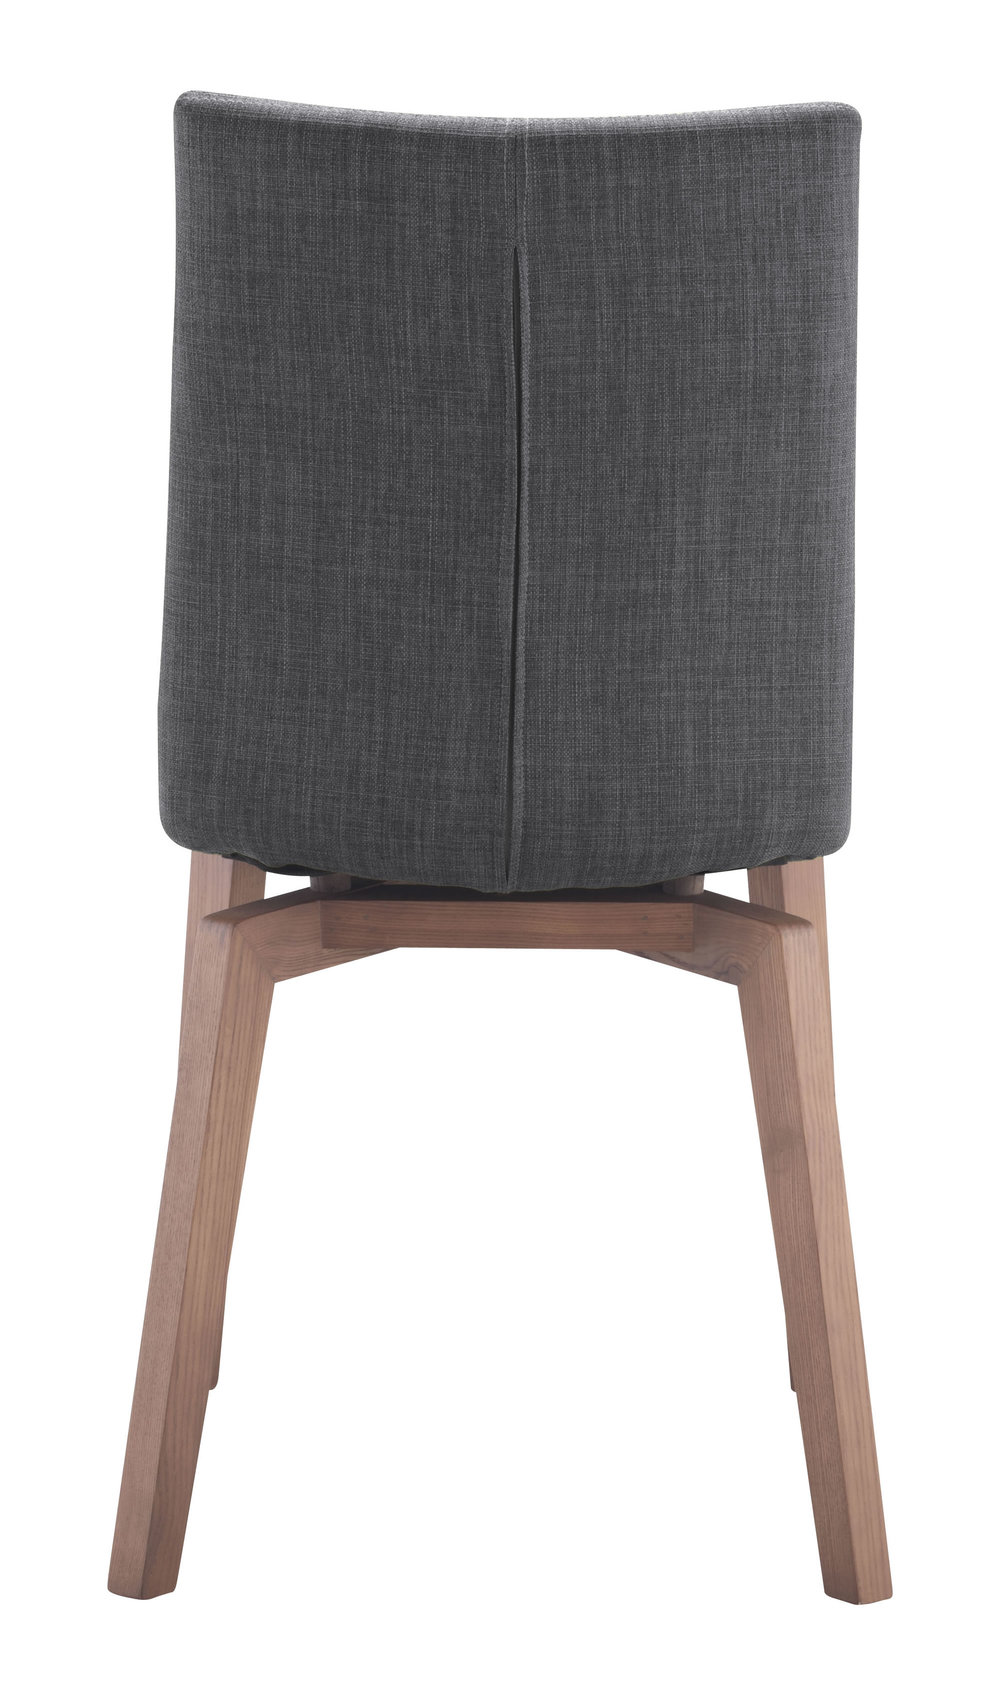 Zuo Modern Contemporary - Orebro Dining Chair - Set of 2 - Graphite